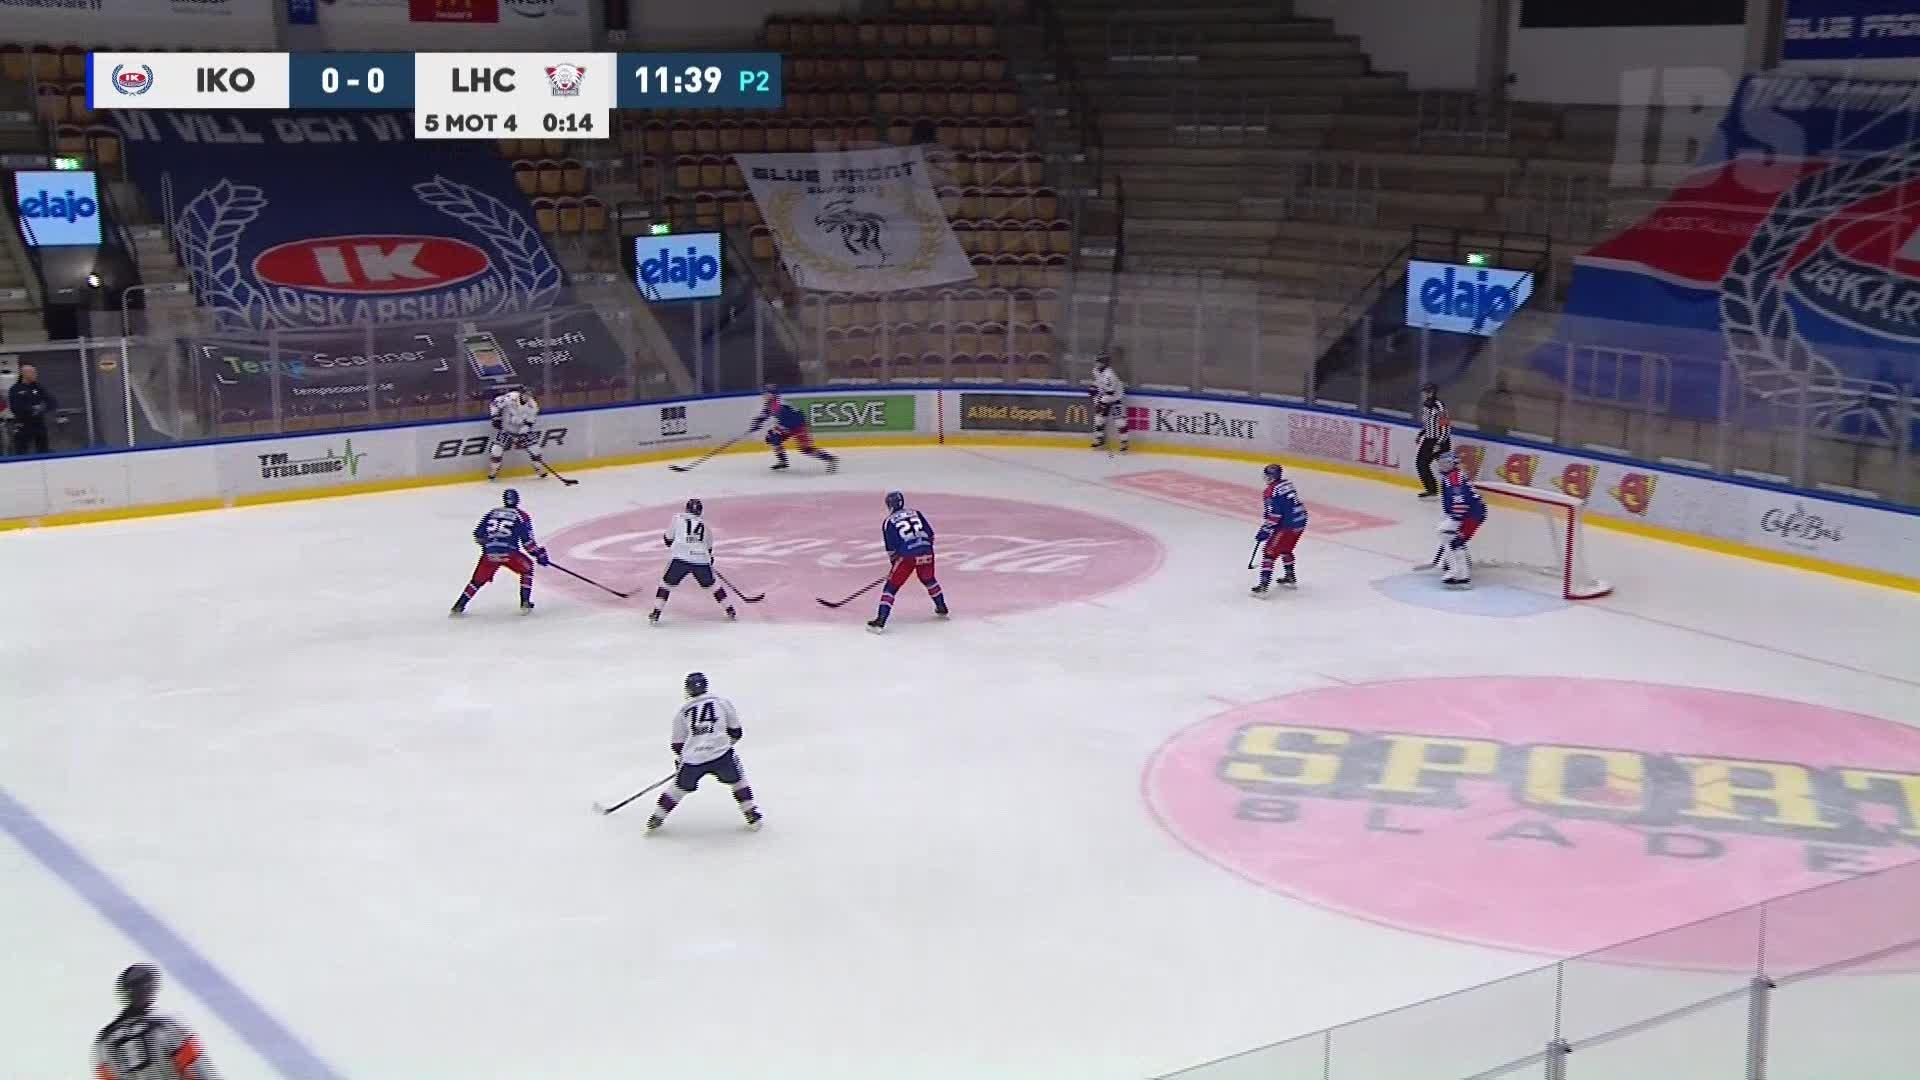 IK Oskarshamn - Linköping HC 0-1